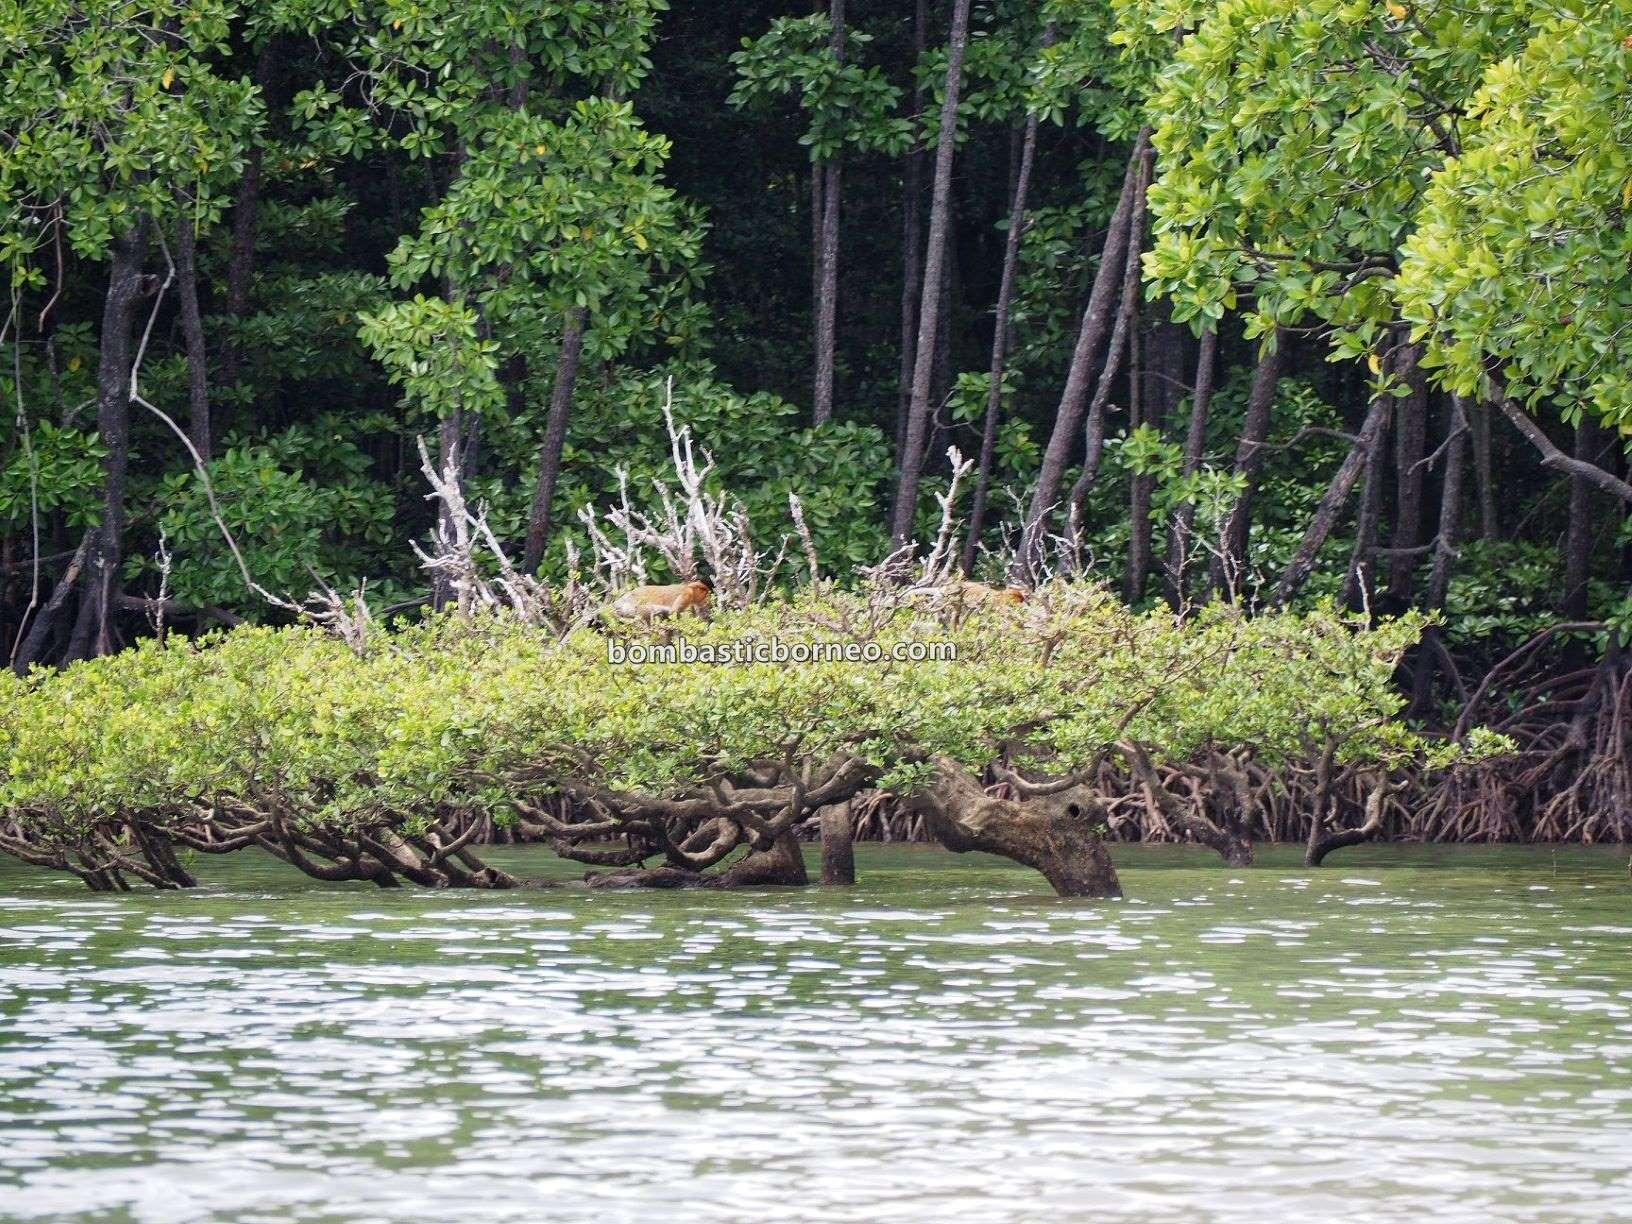 island, exploration, adventure, nature, backpackers, destination, Nasalis Lavartus, Proboscis monkey, wildlife, Ecotourism, tourist attraction, Cross Border, Borneo, 婆罗洲旅游景点, 马来西亚沙巴长鼻猴